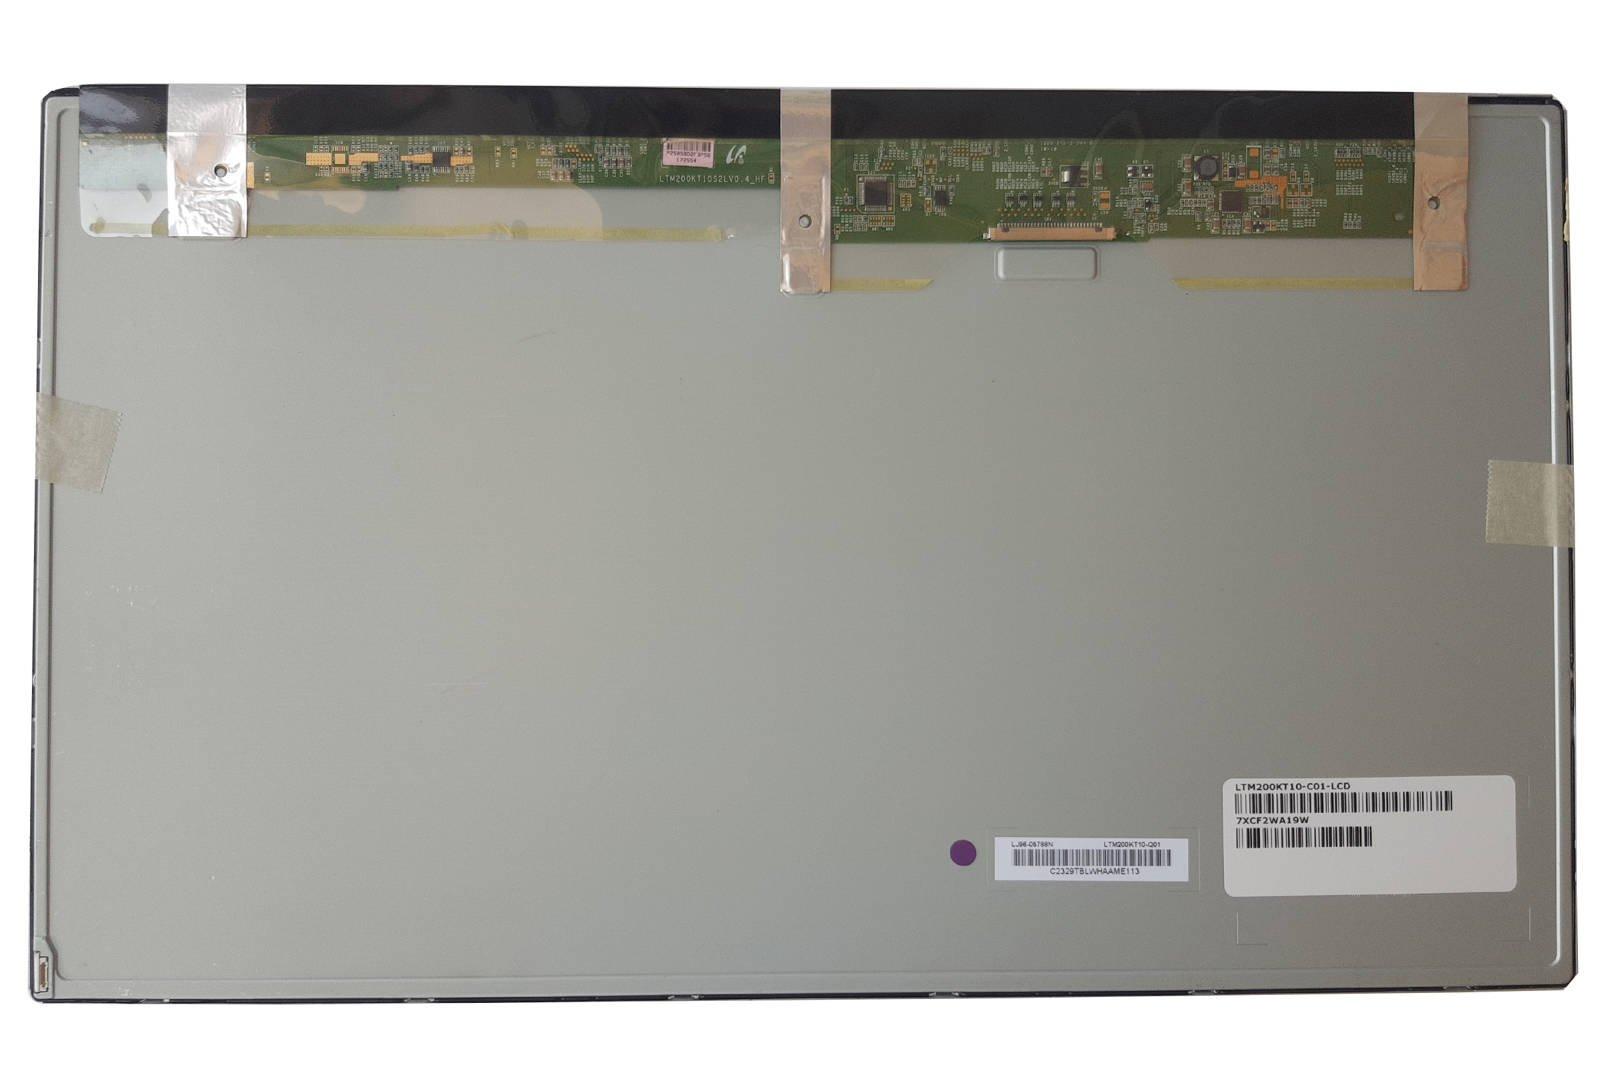 Bildschirm Samsung 20' LTM200KT10 1600 x 900